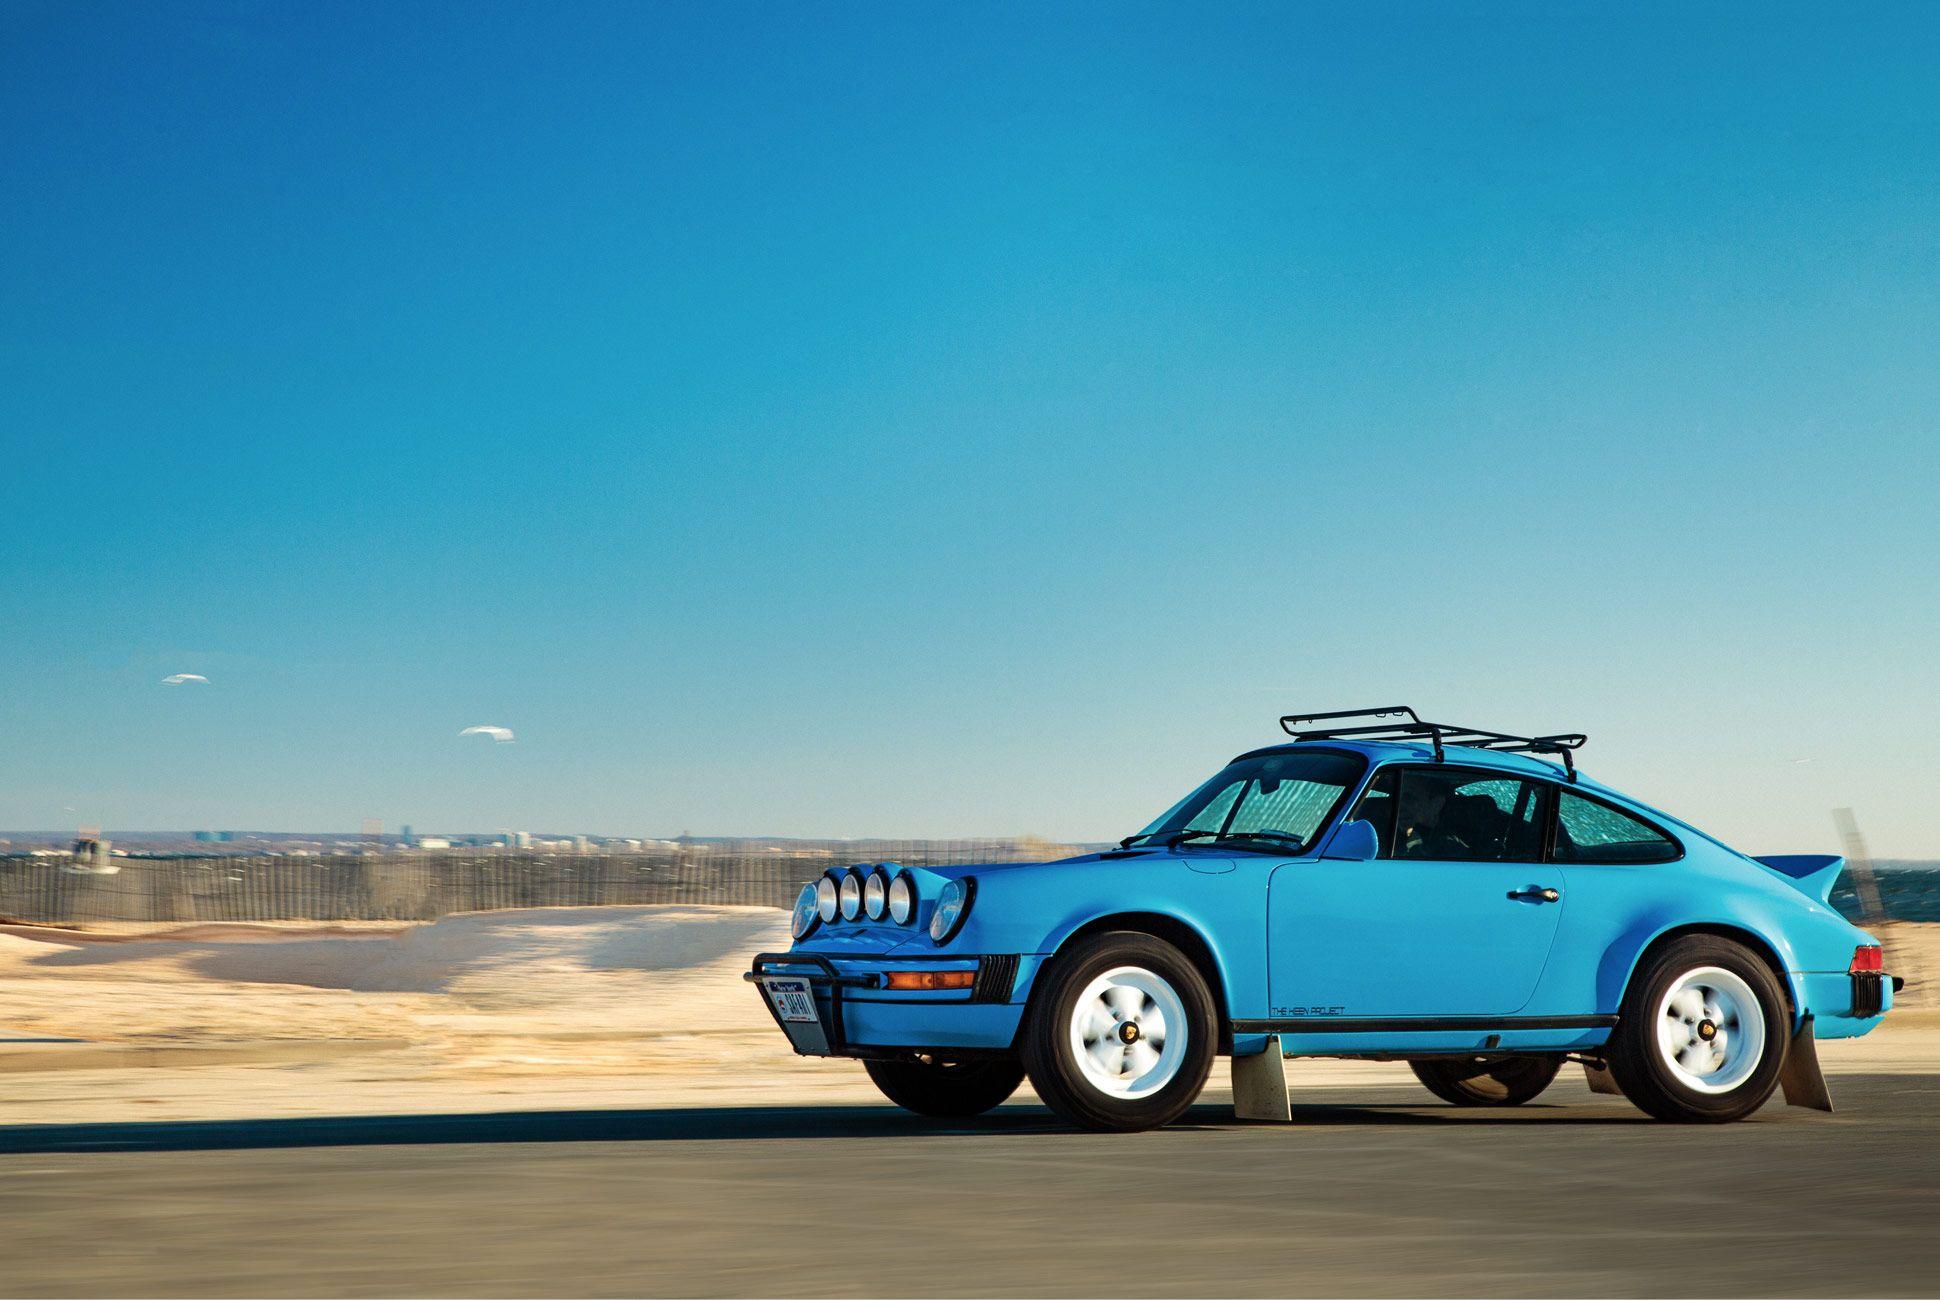 Restomod-Cars-Gear-Patrol-Porsche-Slide-1